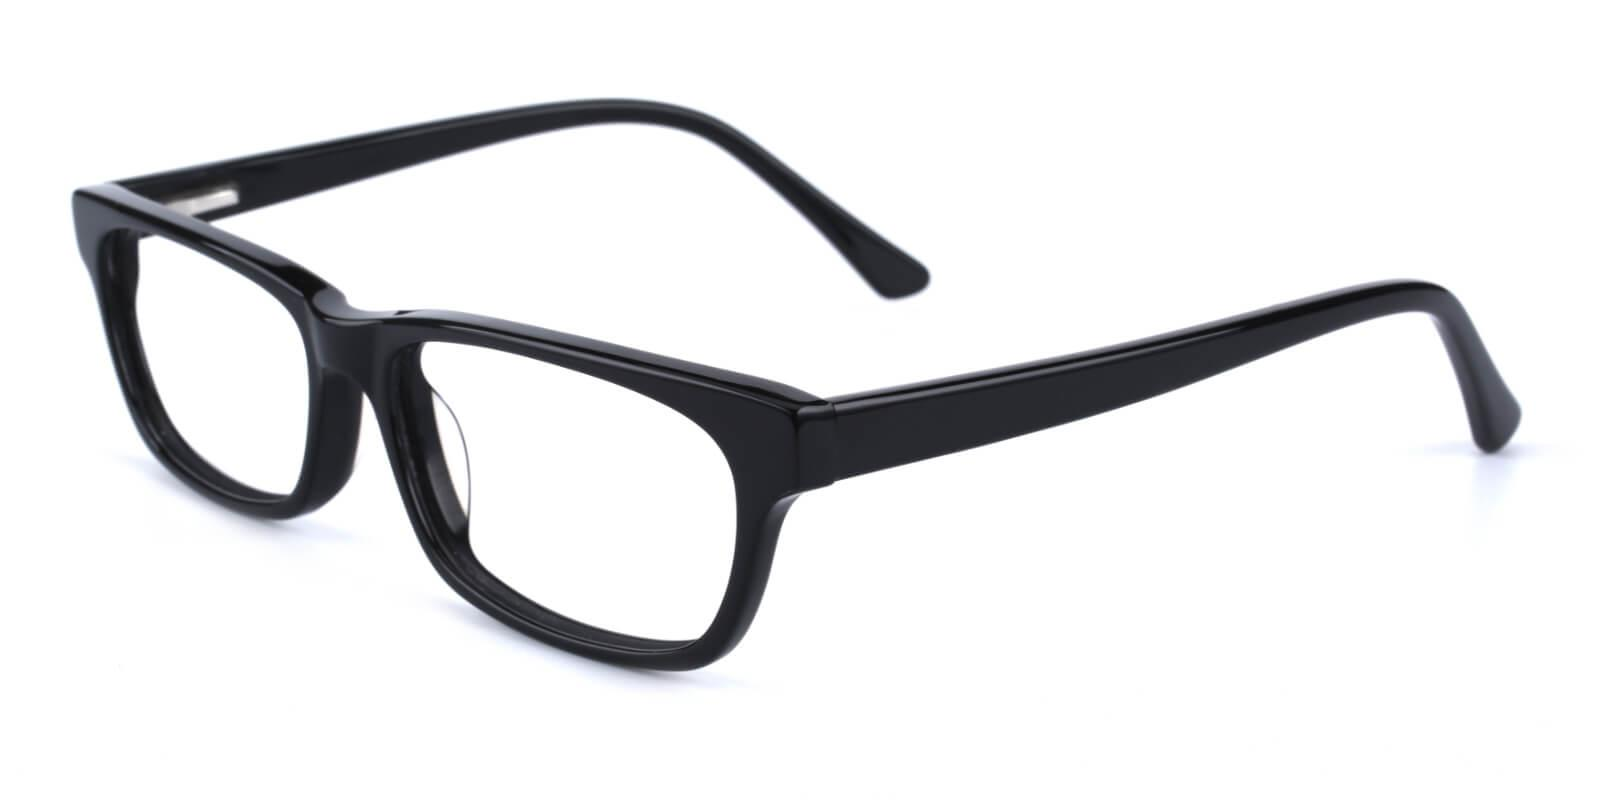 Mia-Black-Rectangle-Acetate-Eyeglasses-additional1